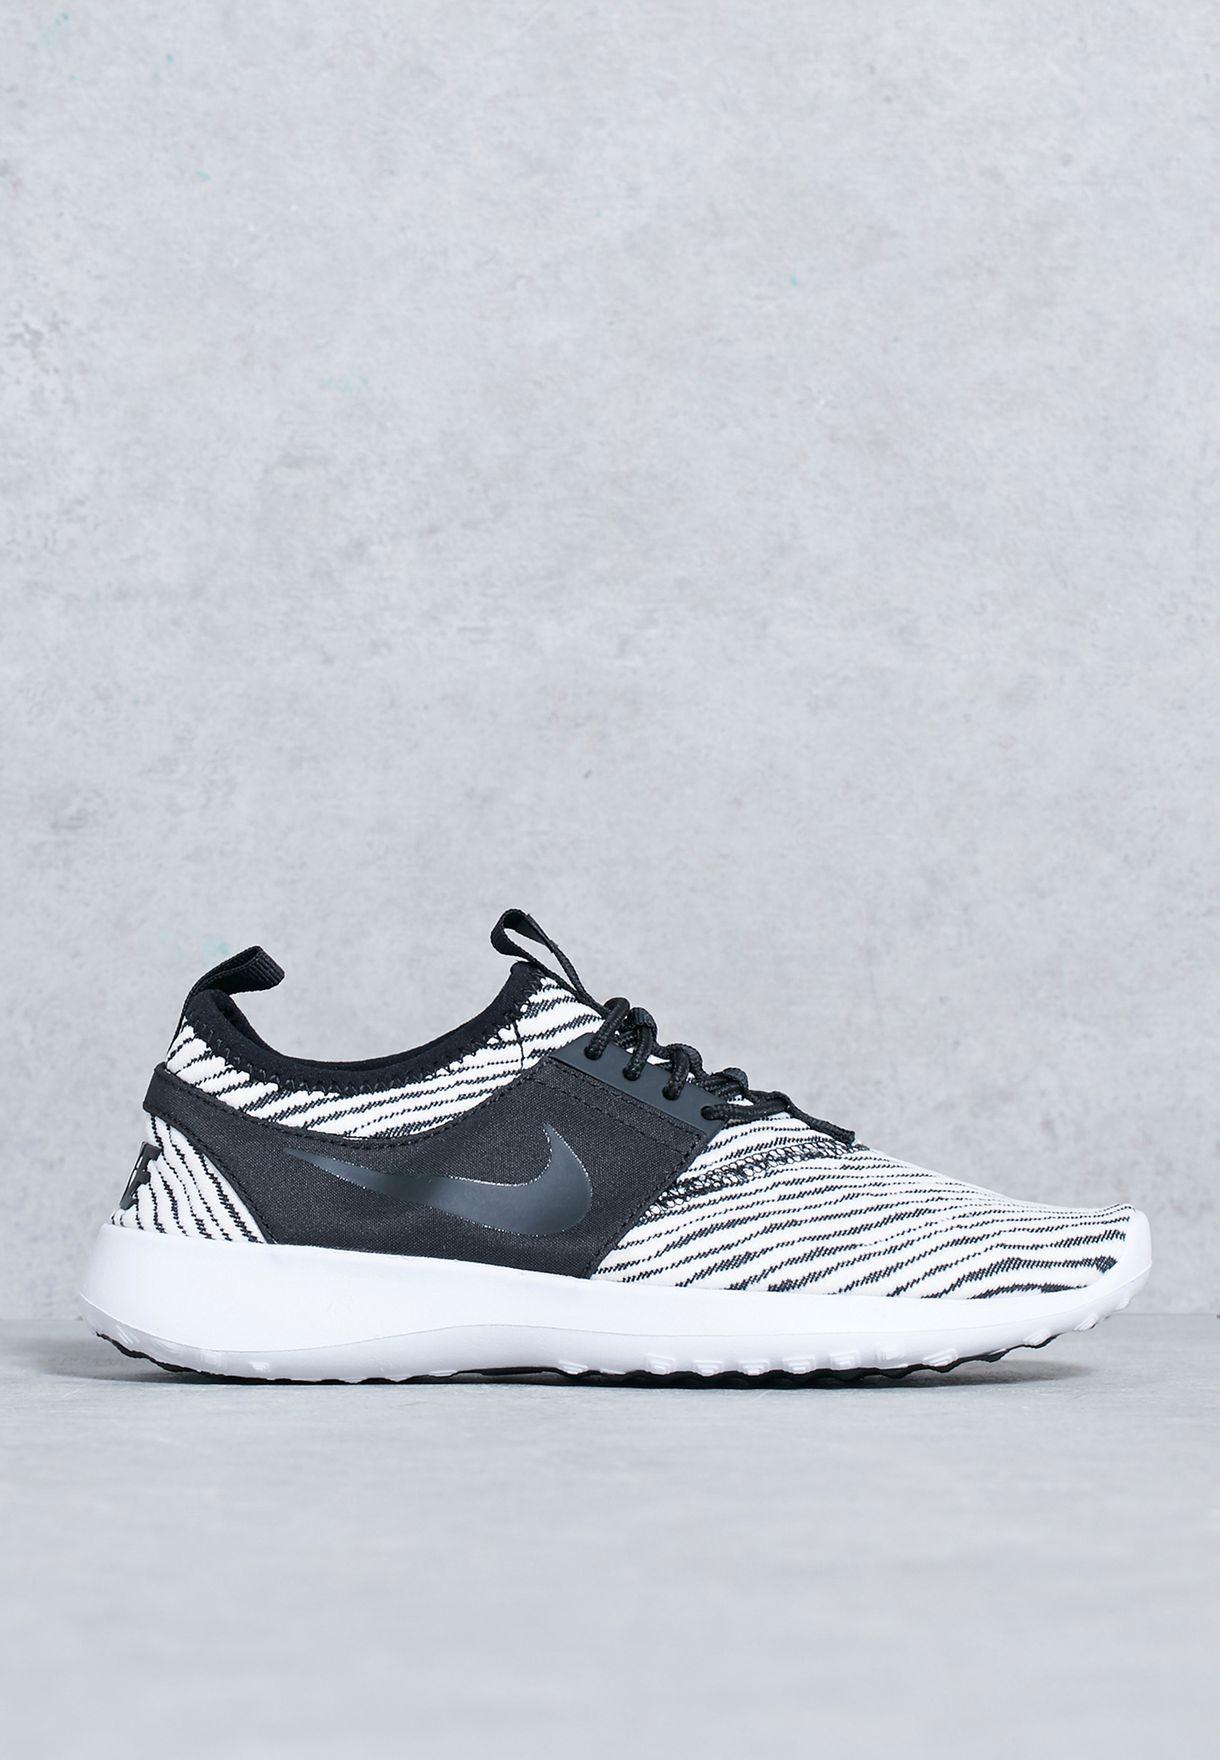 Ahorro puente Suavemente  Buy Nike monochrome Juvenate SE for Women in MENA, Worldwide   862335-004